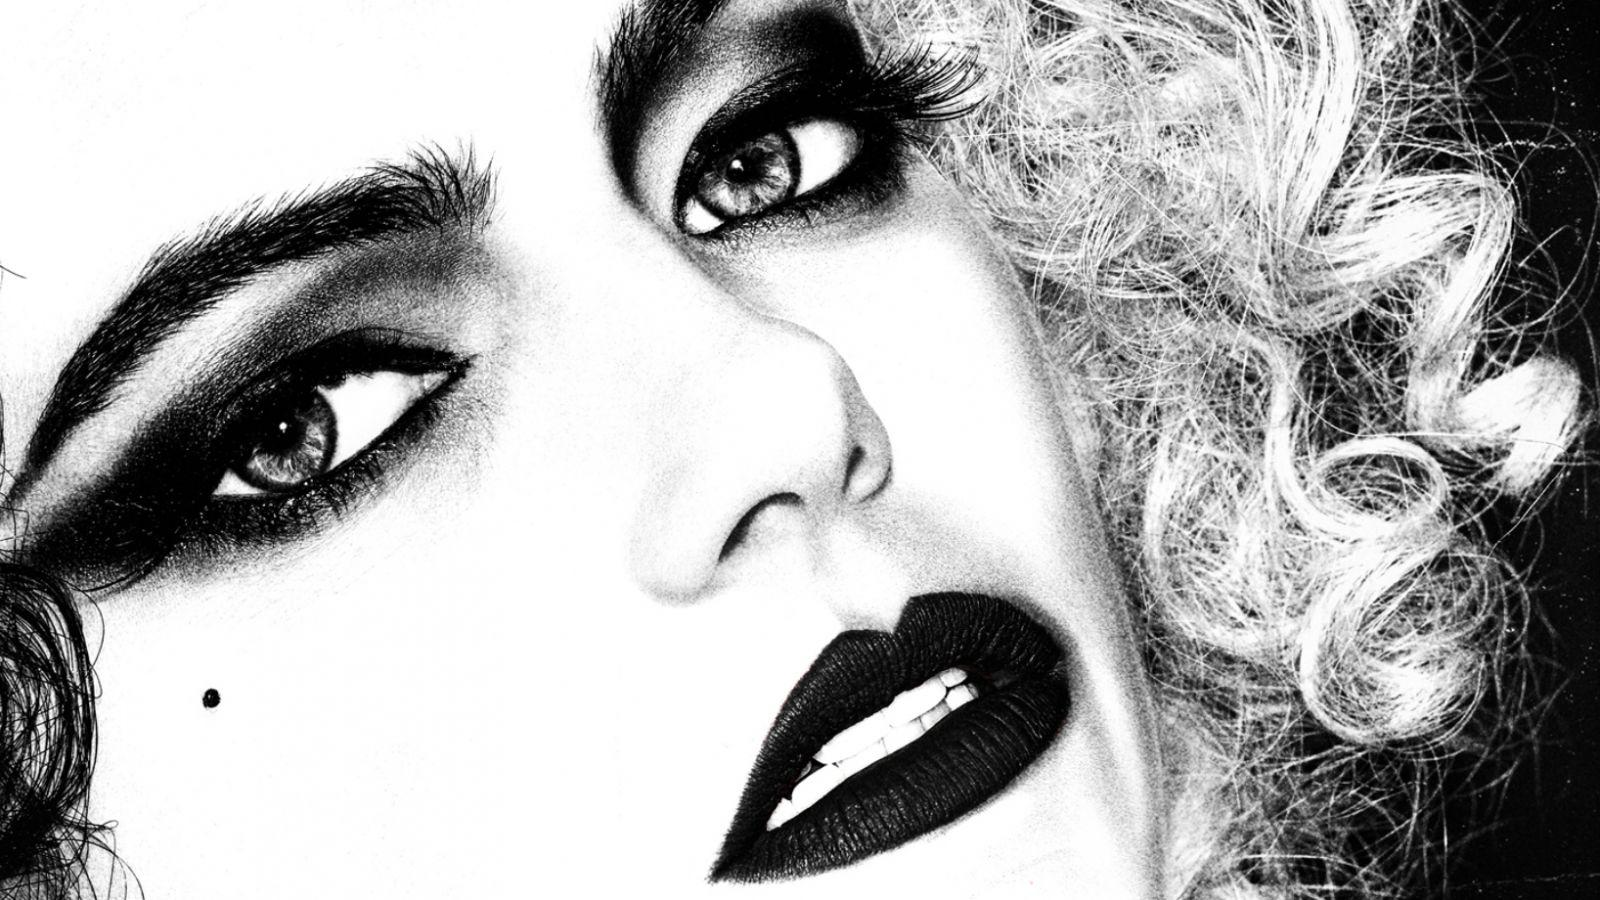 Emma Stone: Είναι η πιο εντυπωσιακή Cruella που έχουμε δει [vid]